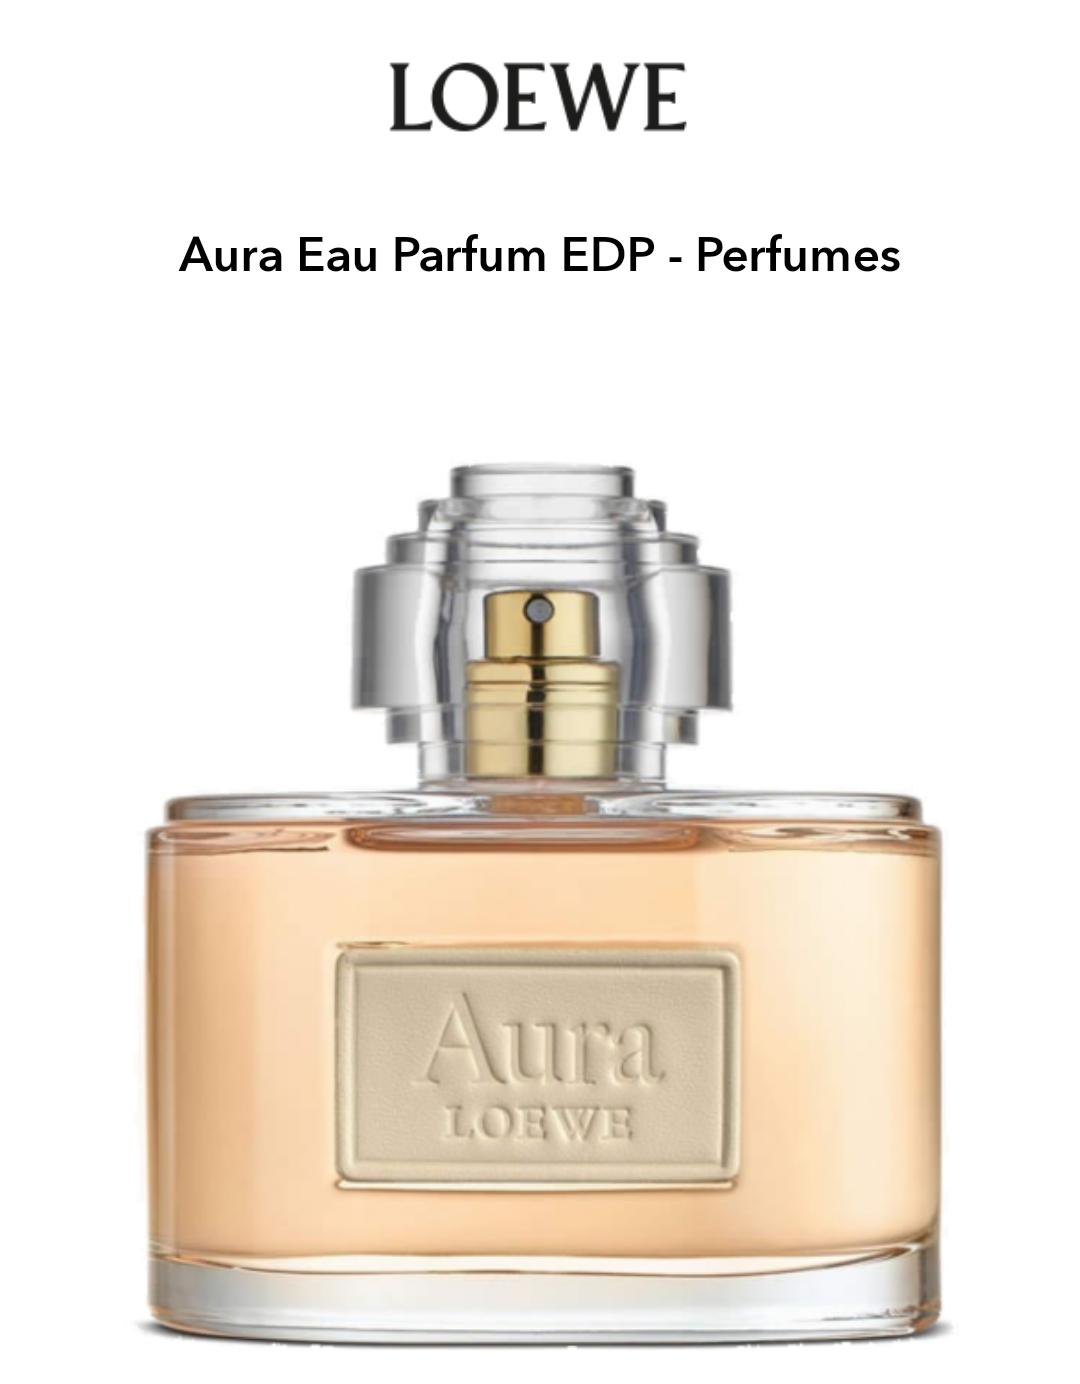 Aura Loewe eau parfum EDP